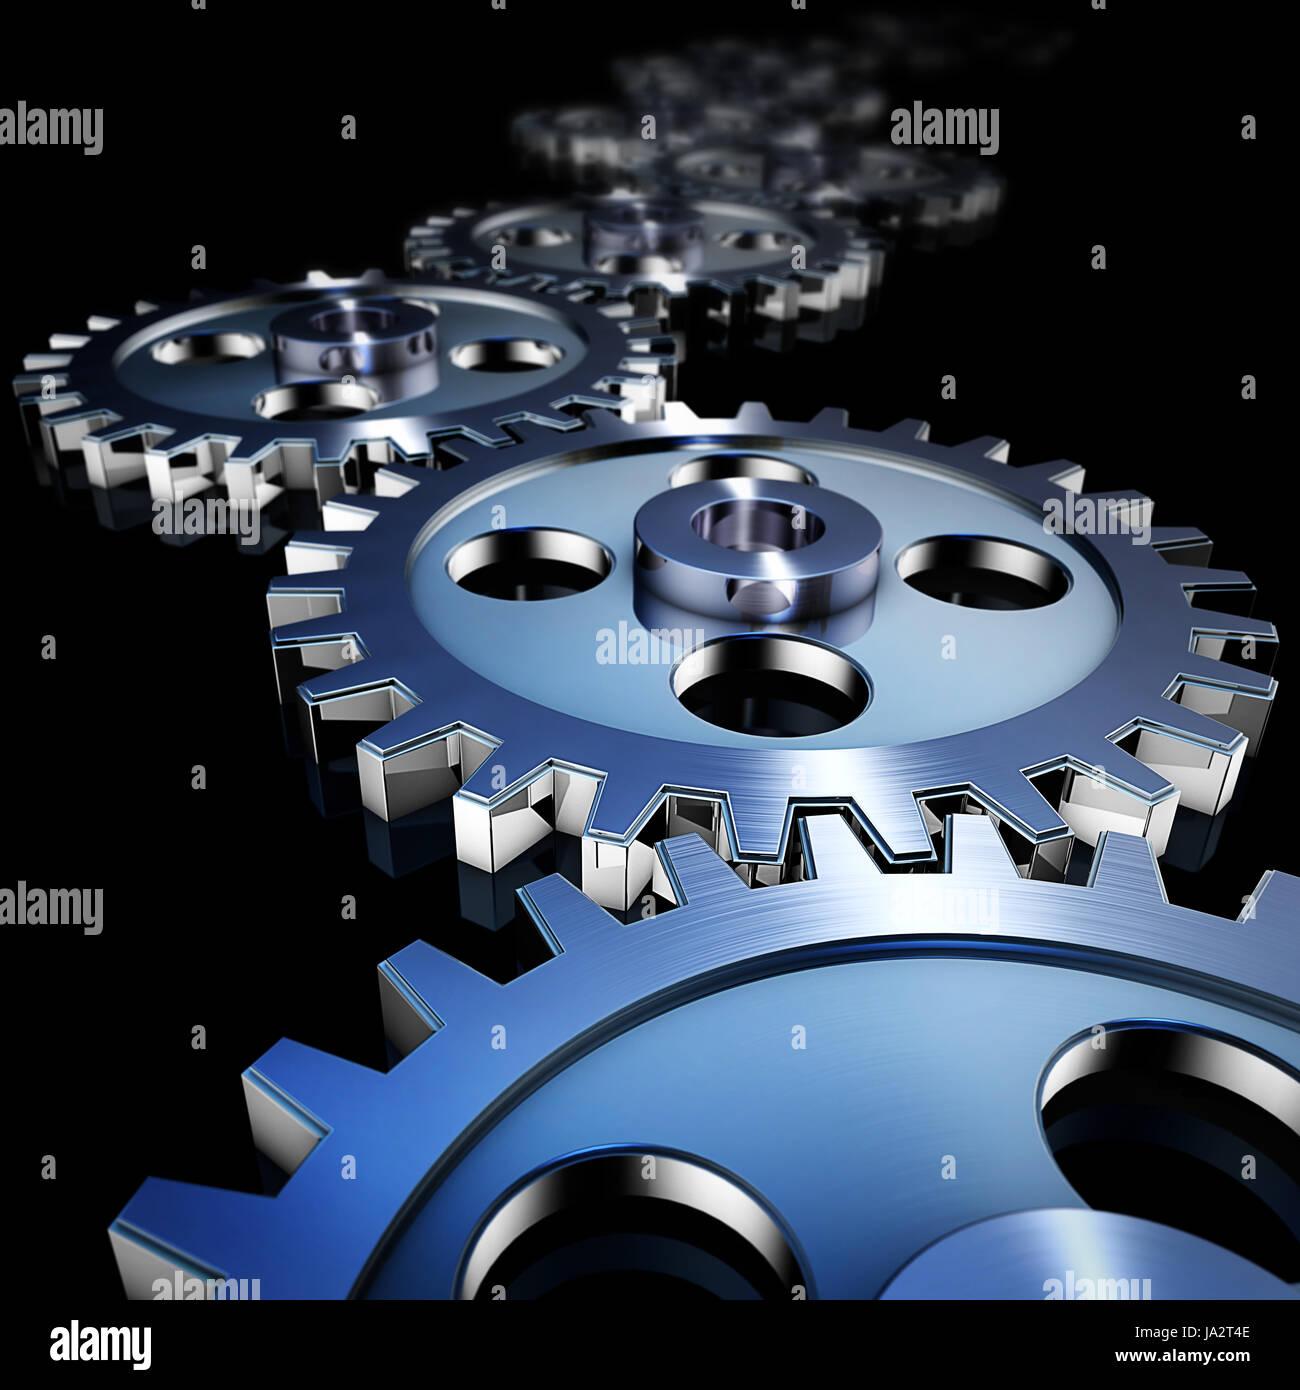 gear, business dealings, deal, business transaction, business, bussiness, work, Stock Photo